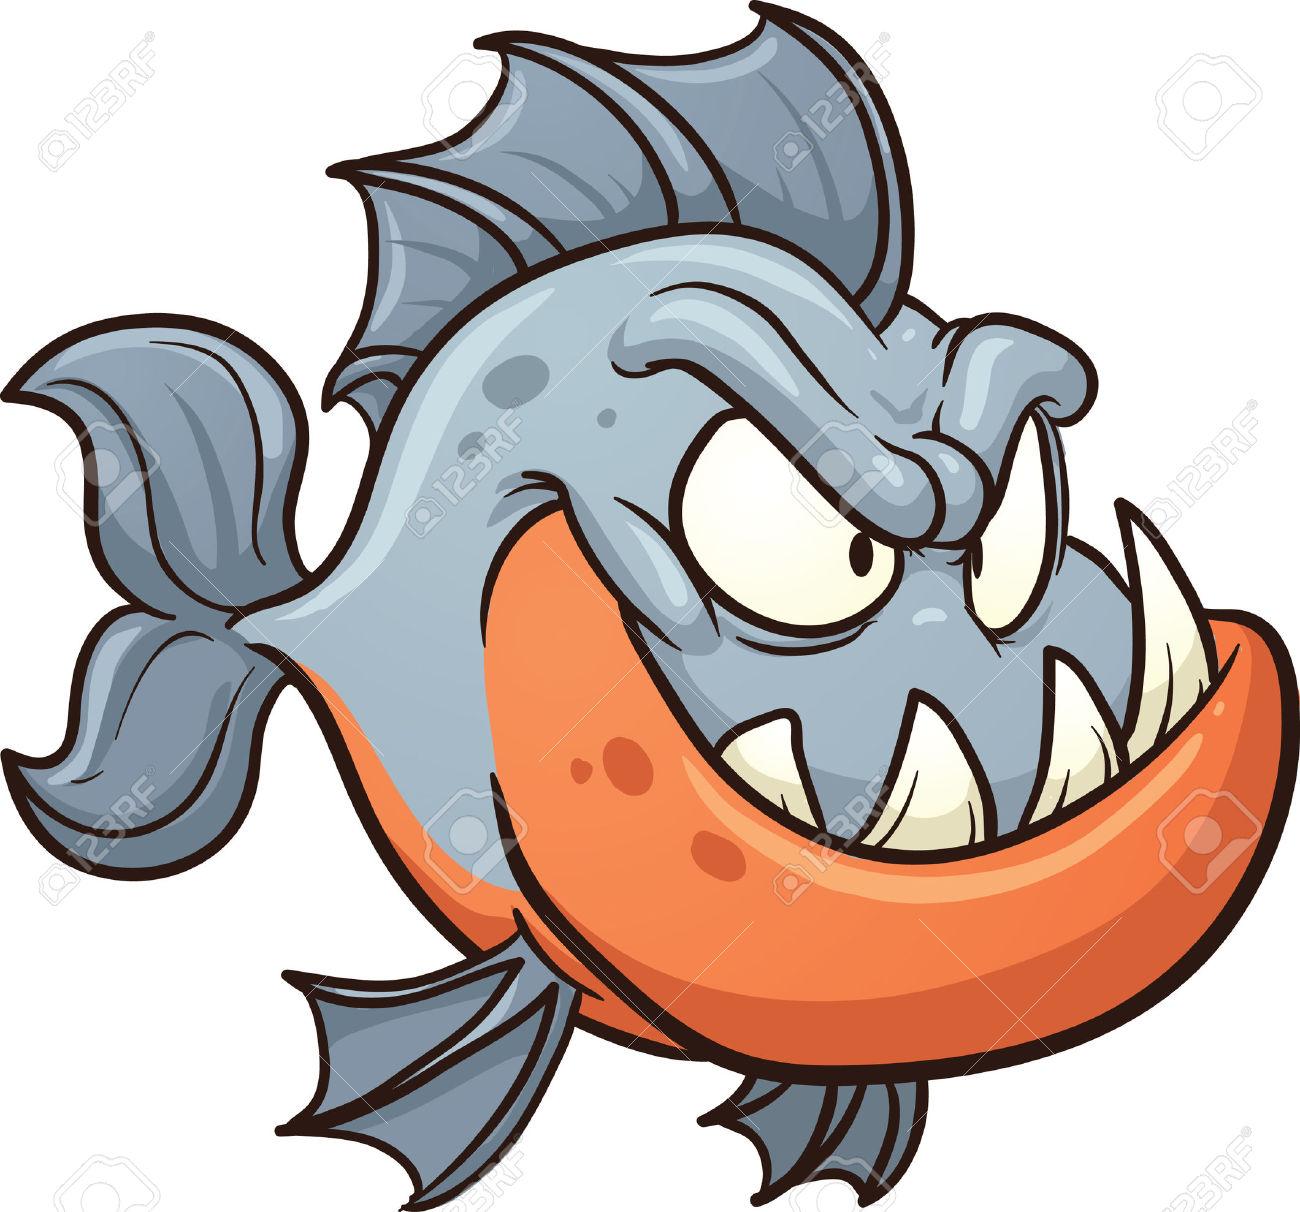 Piranha Clipart #1